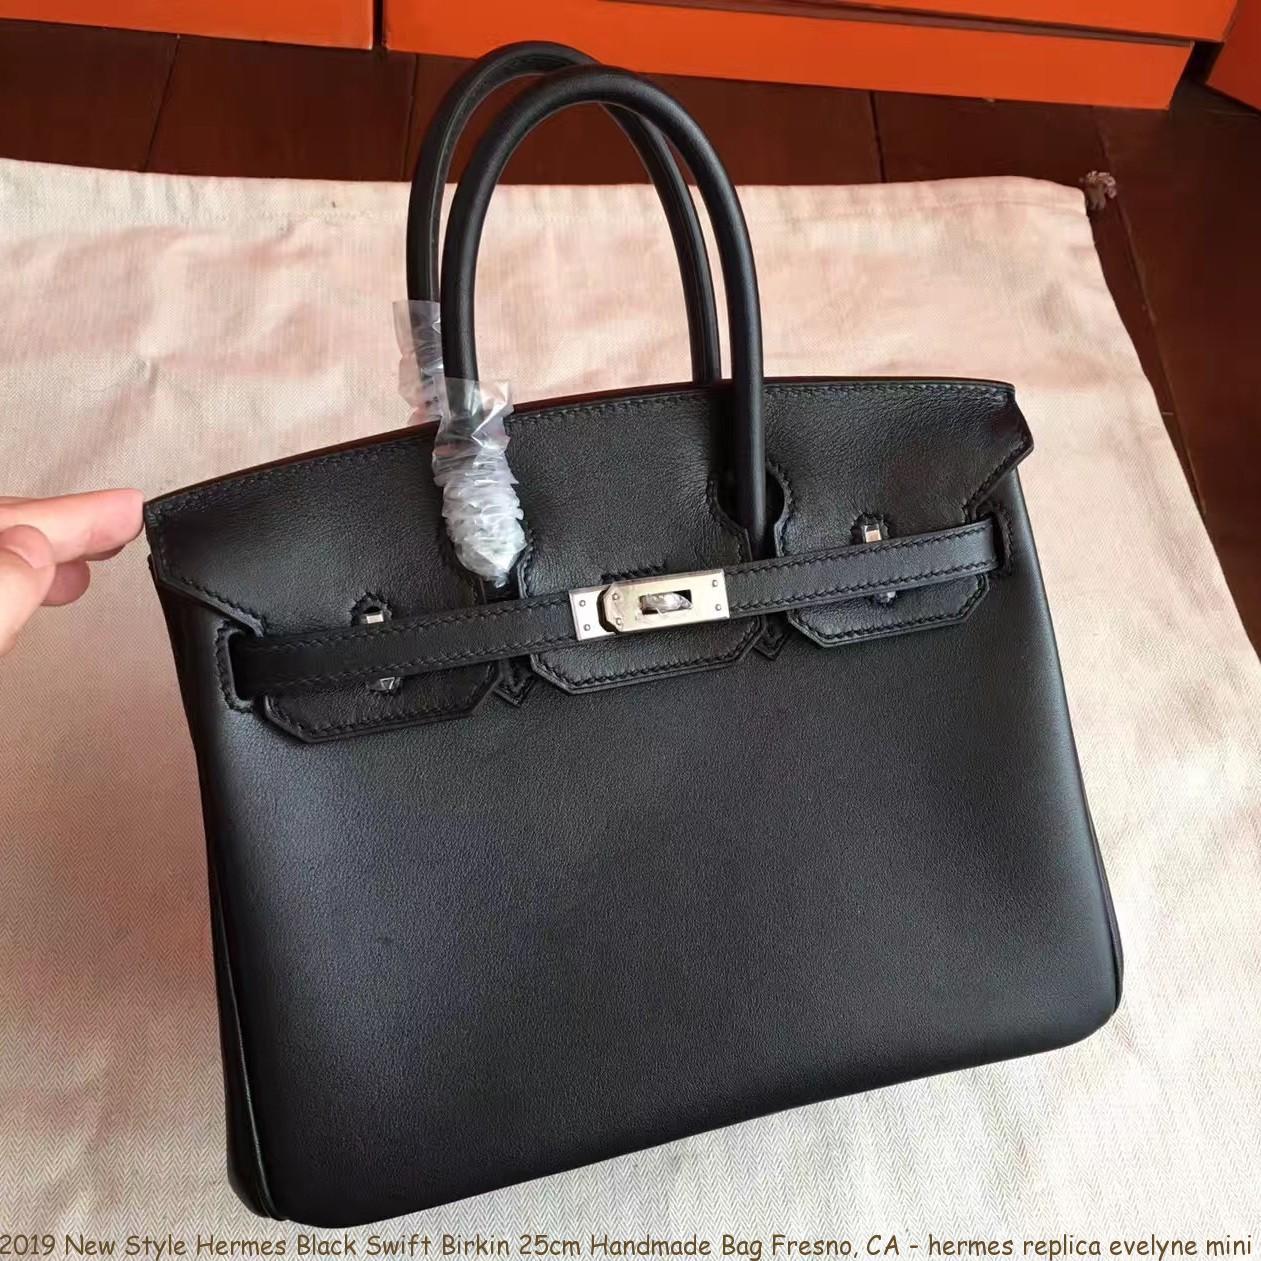 2019 New Style Hermes Black Swift Birkin 25cm Handmade Bag Fresno ... b39d424a54f90